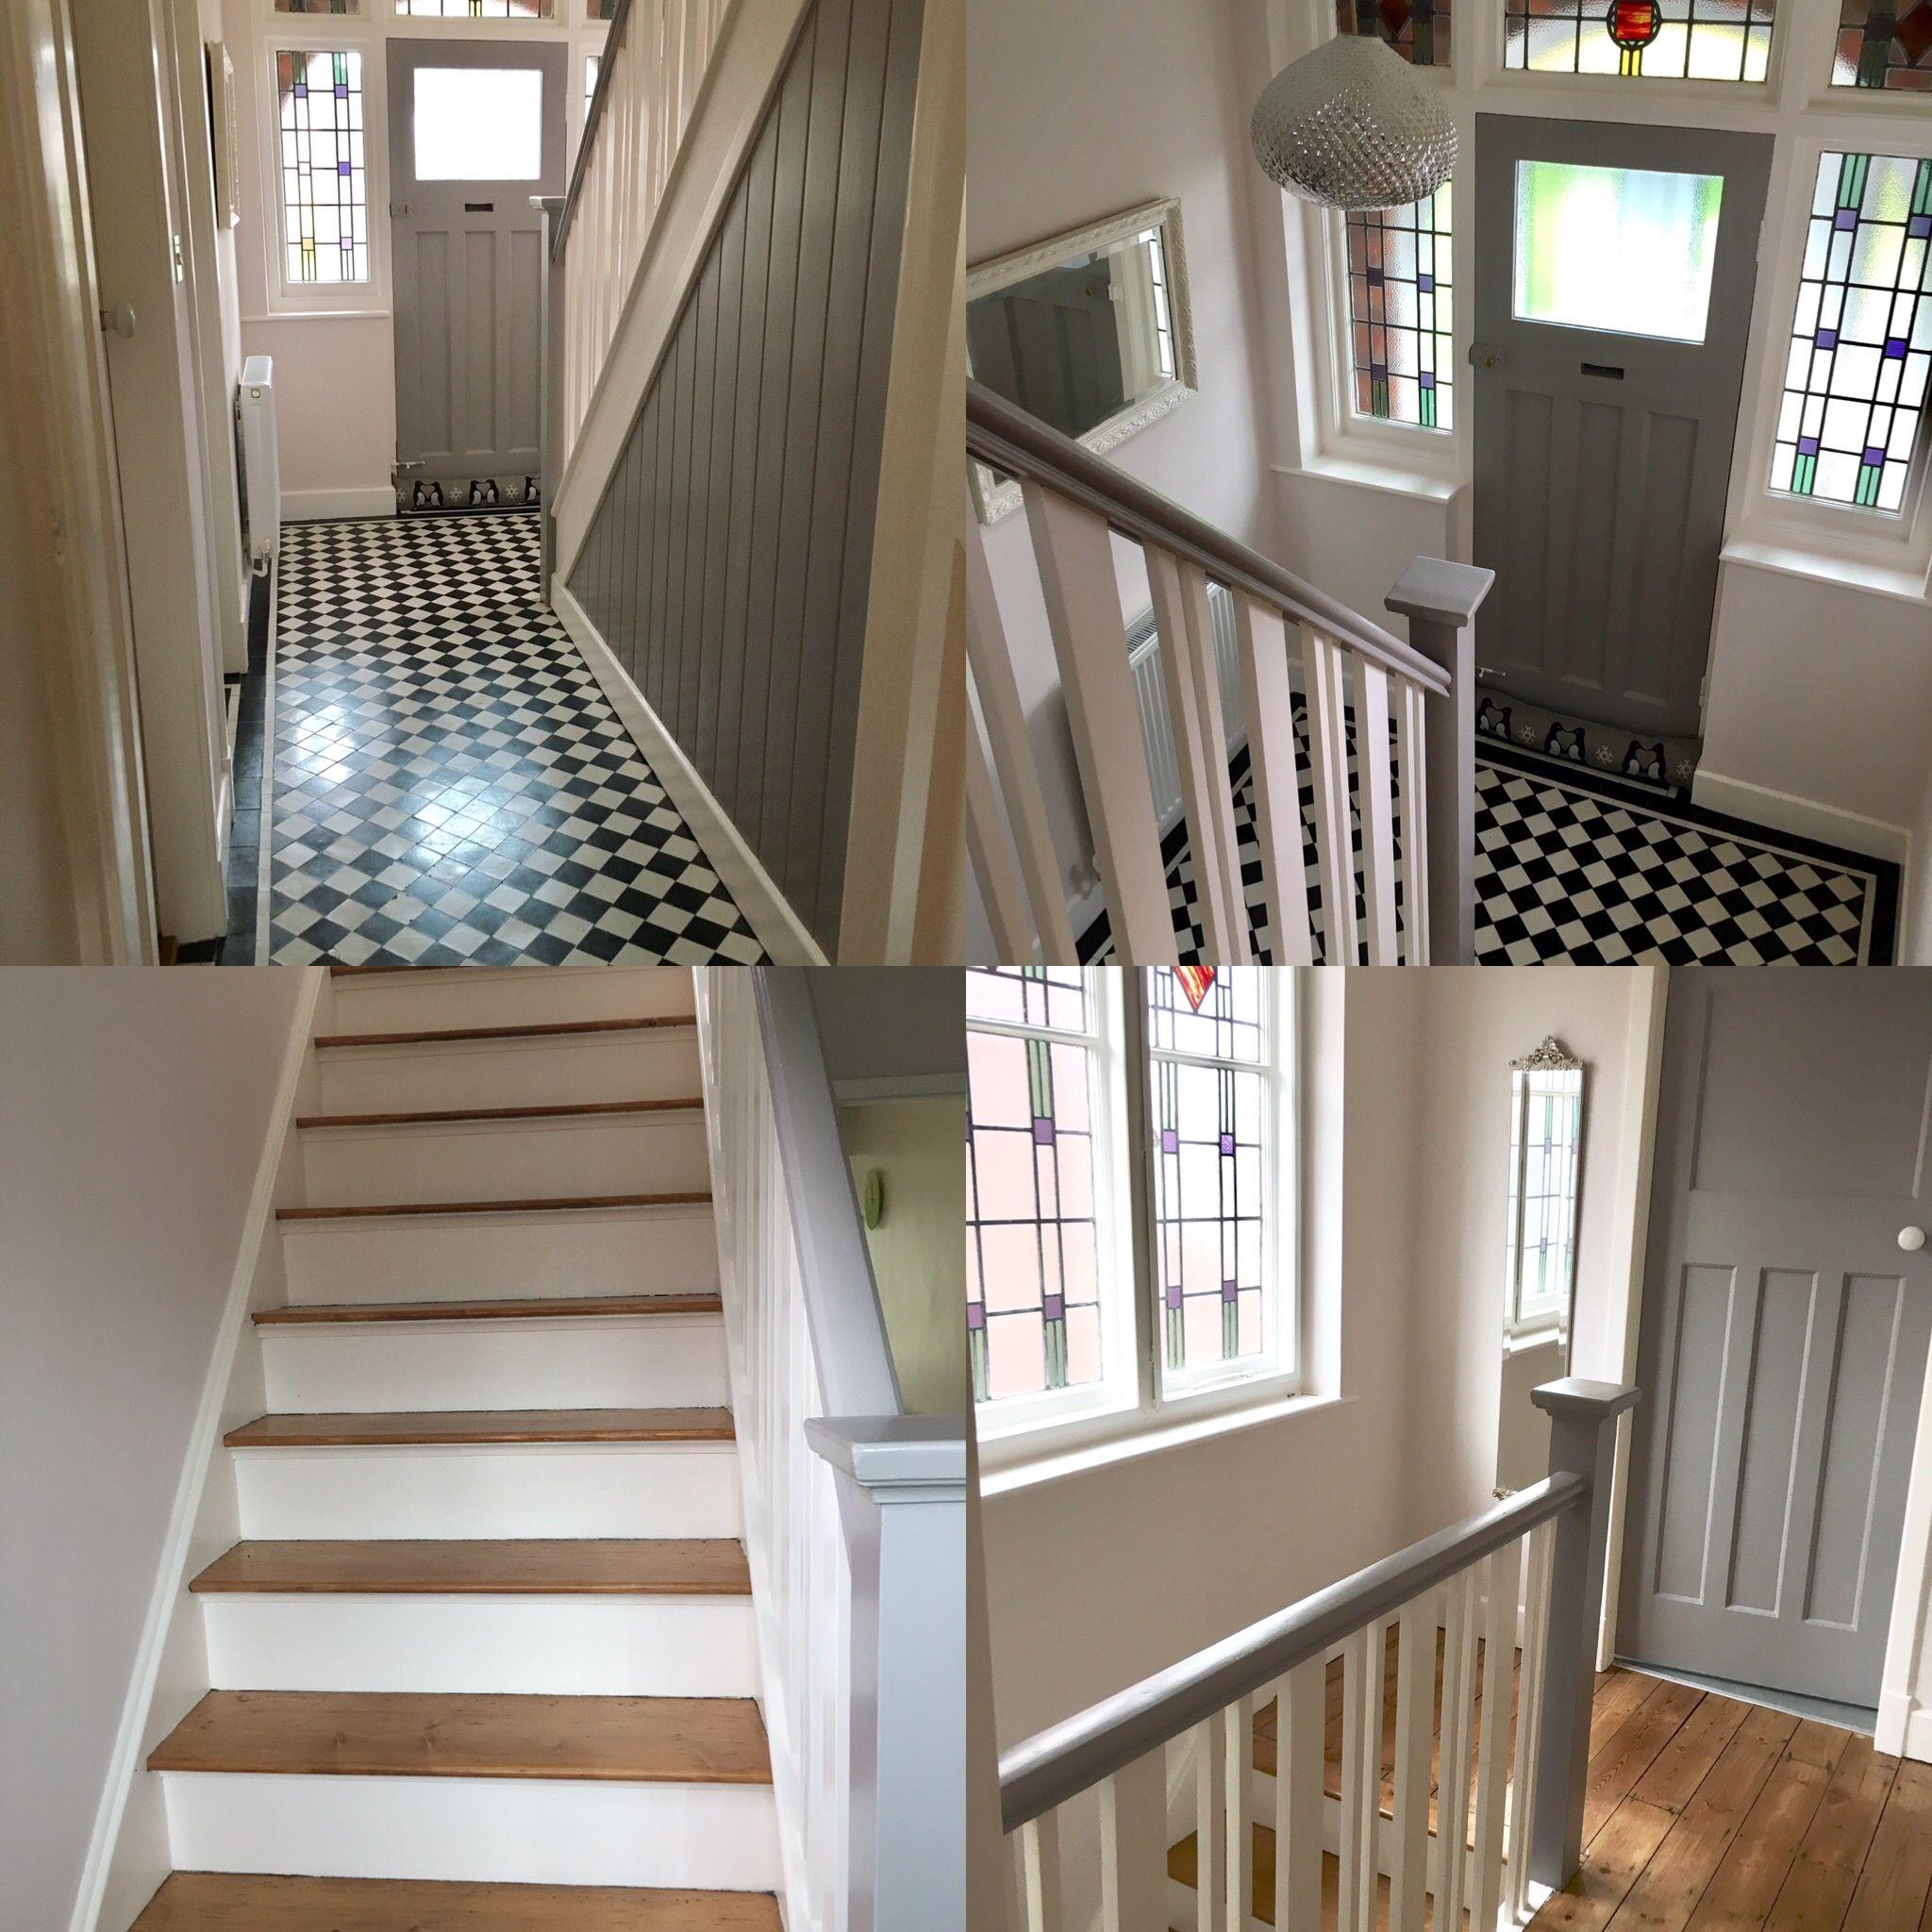 Best My 1930 S Hallway Renovation With Original Minton Tiles 400 x 300